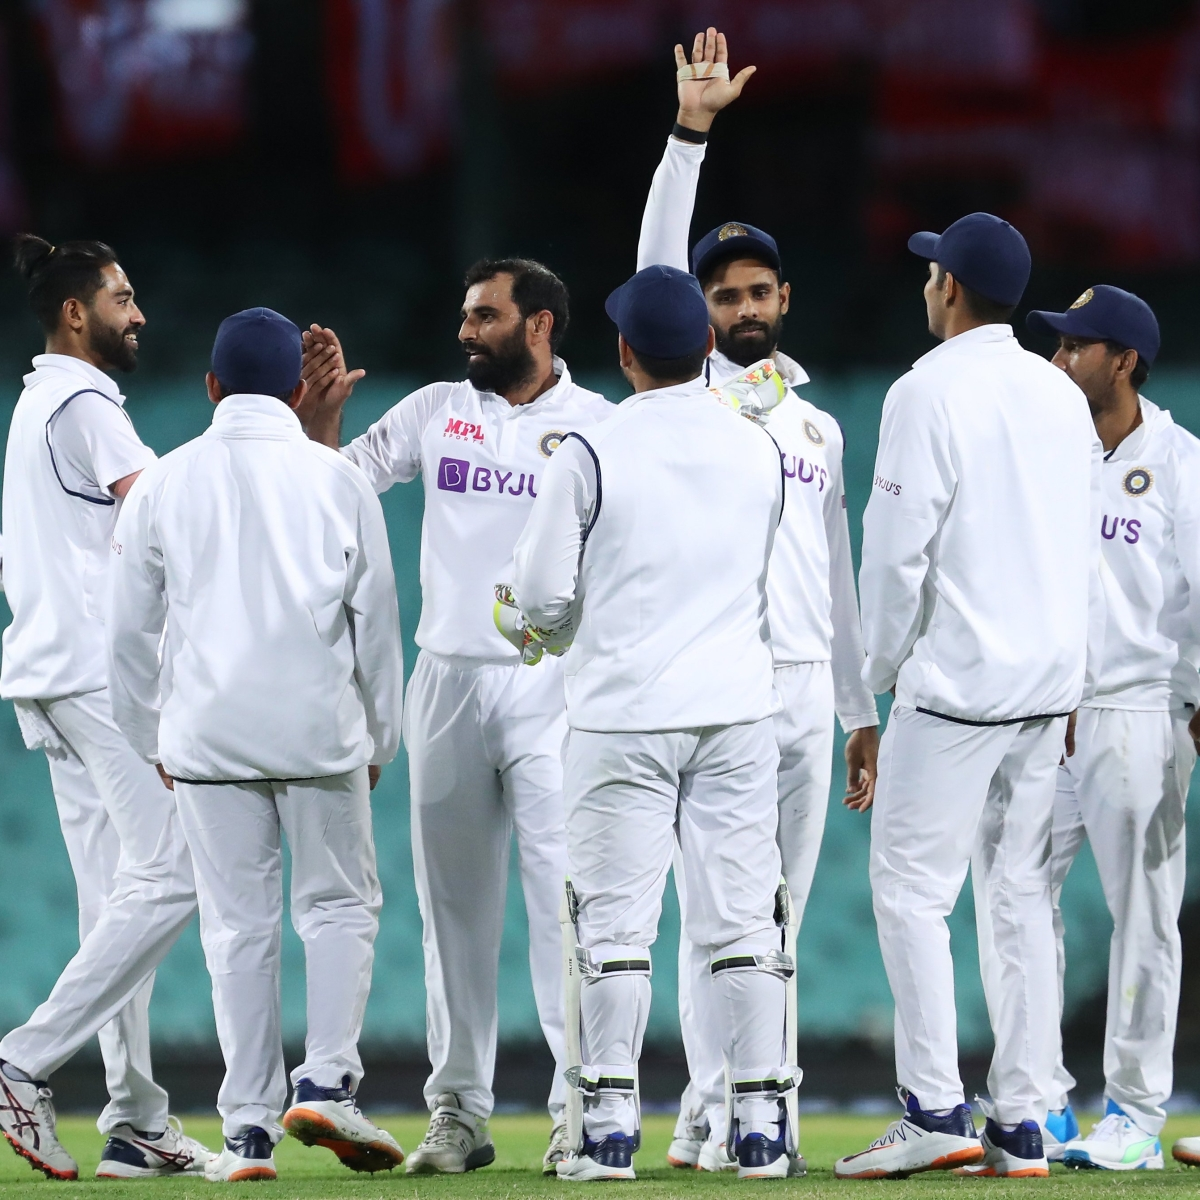 Ind vs Aus 1st Test: Prithvi Shaw, Wriddhiman Saha get the nod ahead of Shubman Gill, Rishabh Pant in playing XI